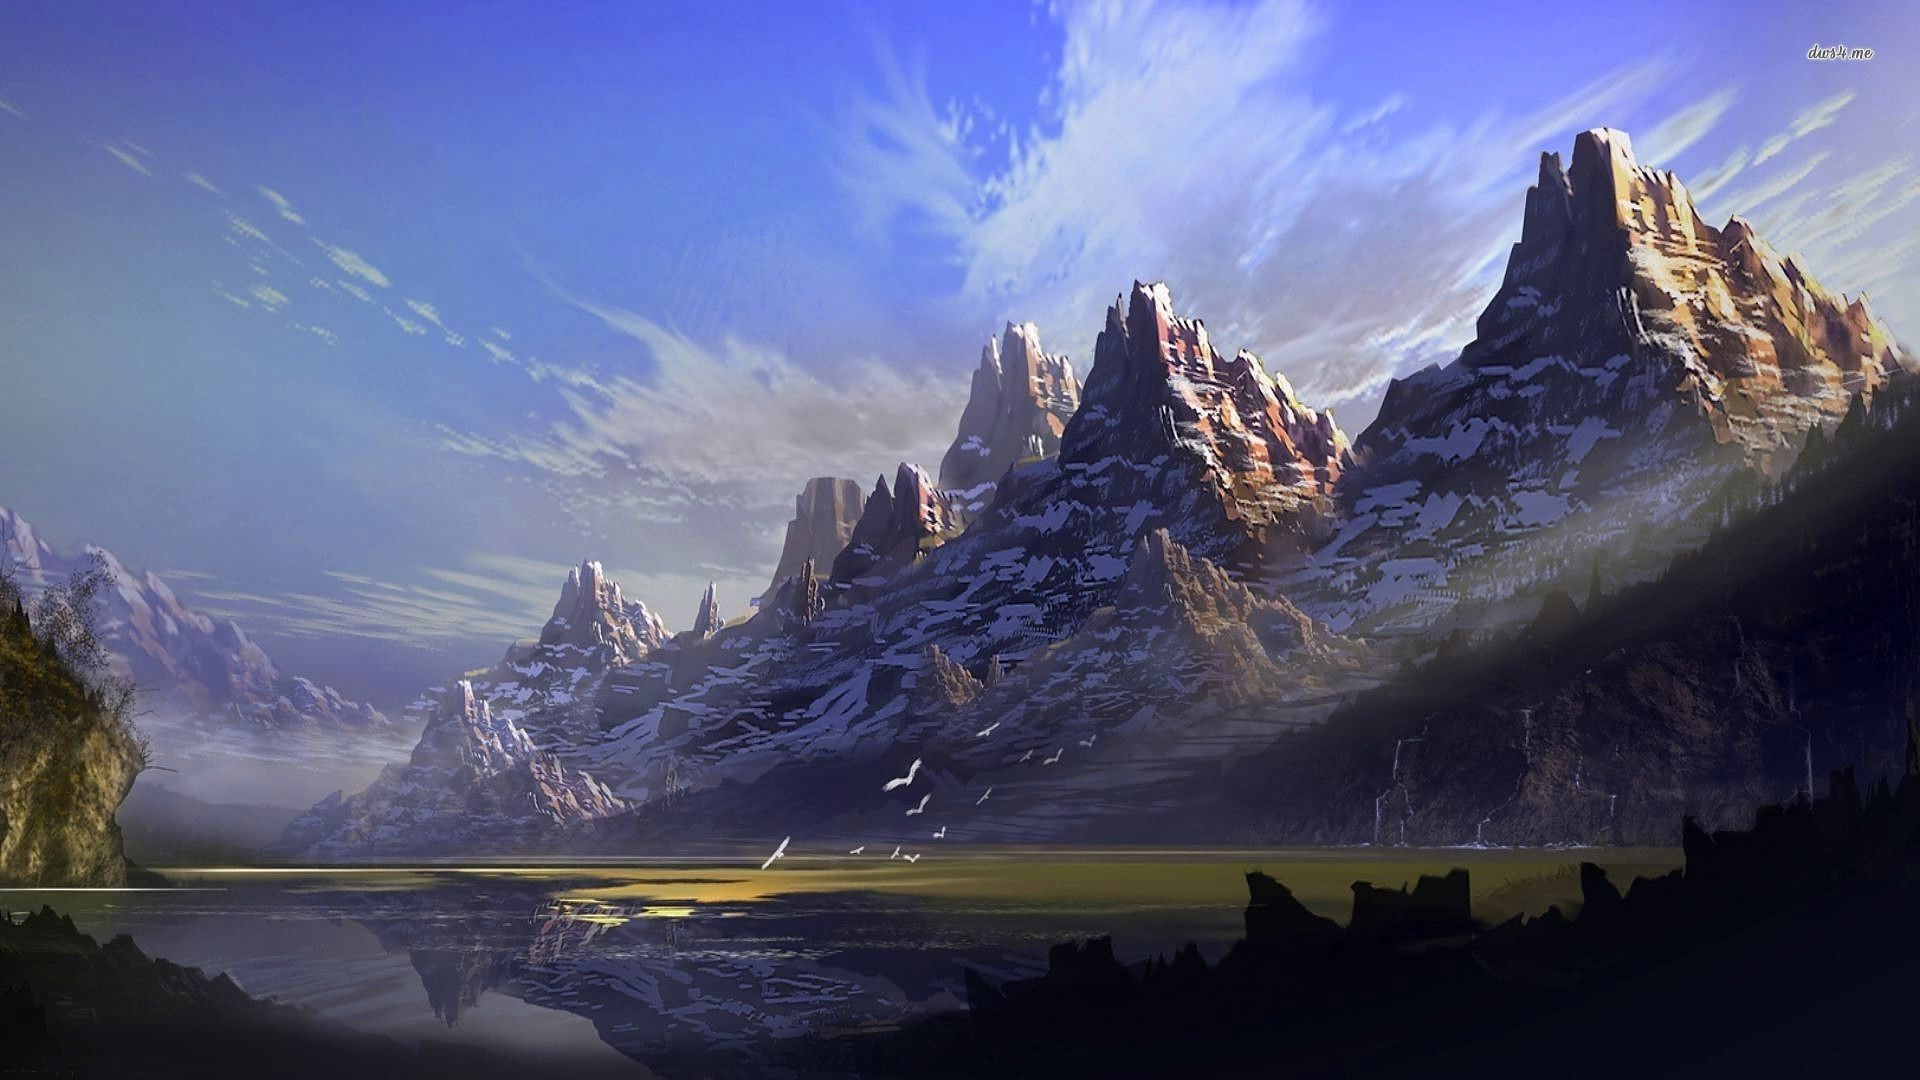 Beautiful Wallpaper Mountain Fantasy - 75a1de4aa7a4d594e7269d0f4cedebd9  Pic_45430.jpg